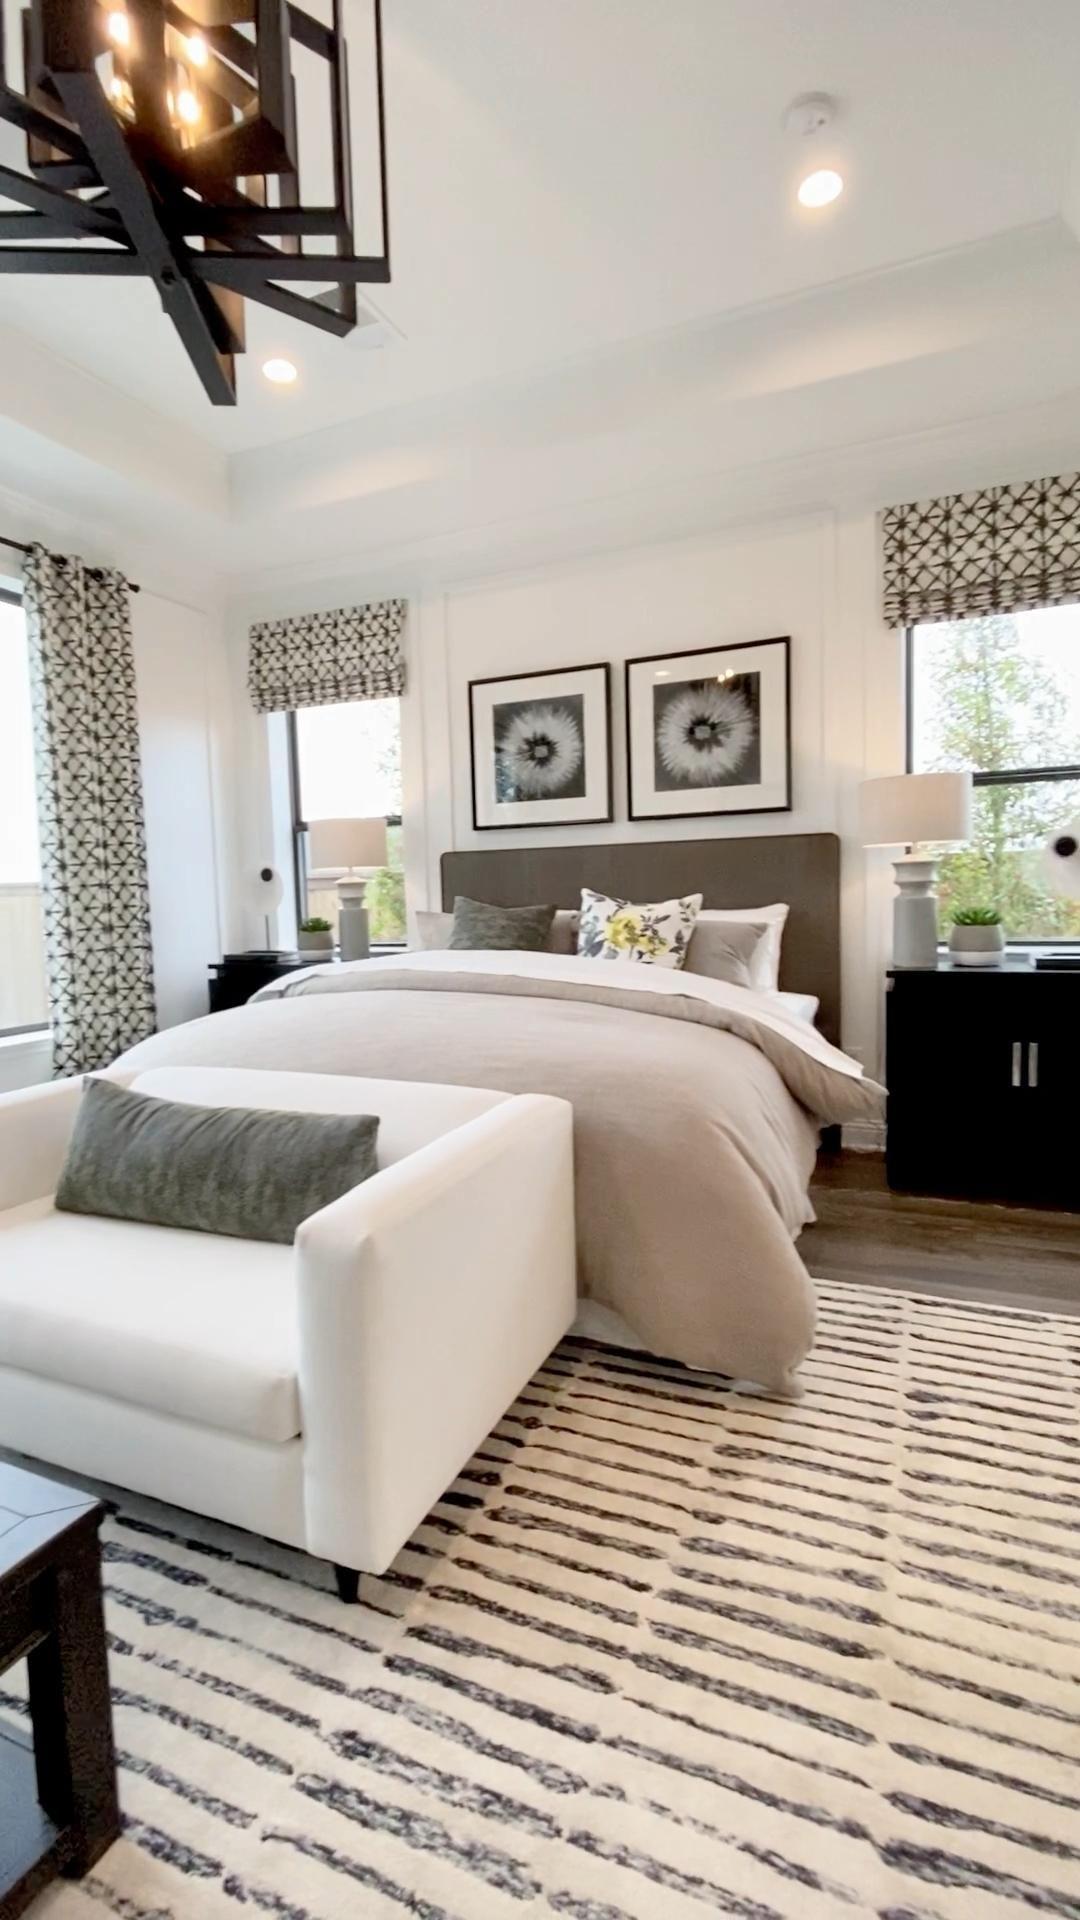 100 Videos Of Model Home Decor Ideas Ideas In 2020 Home Decor Home Decor